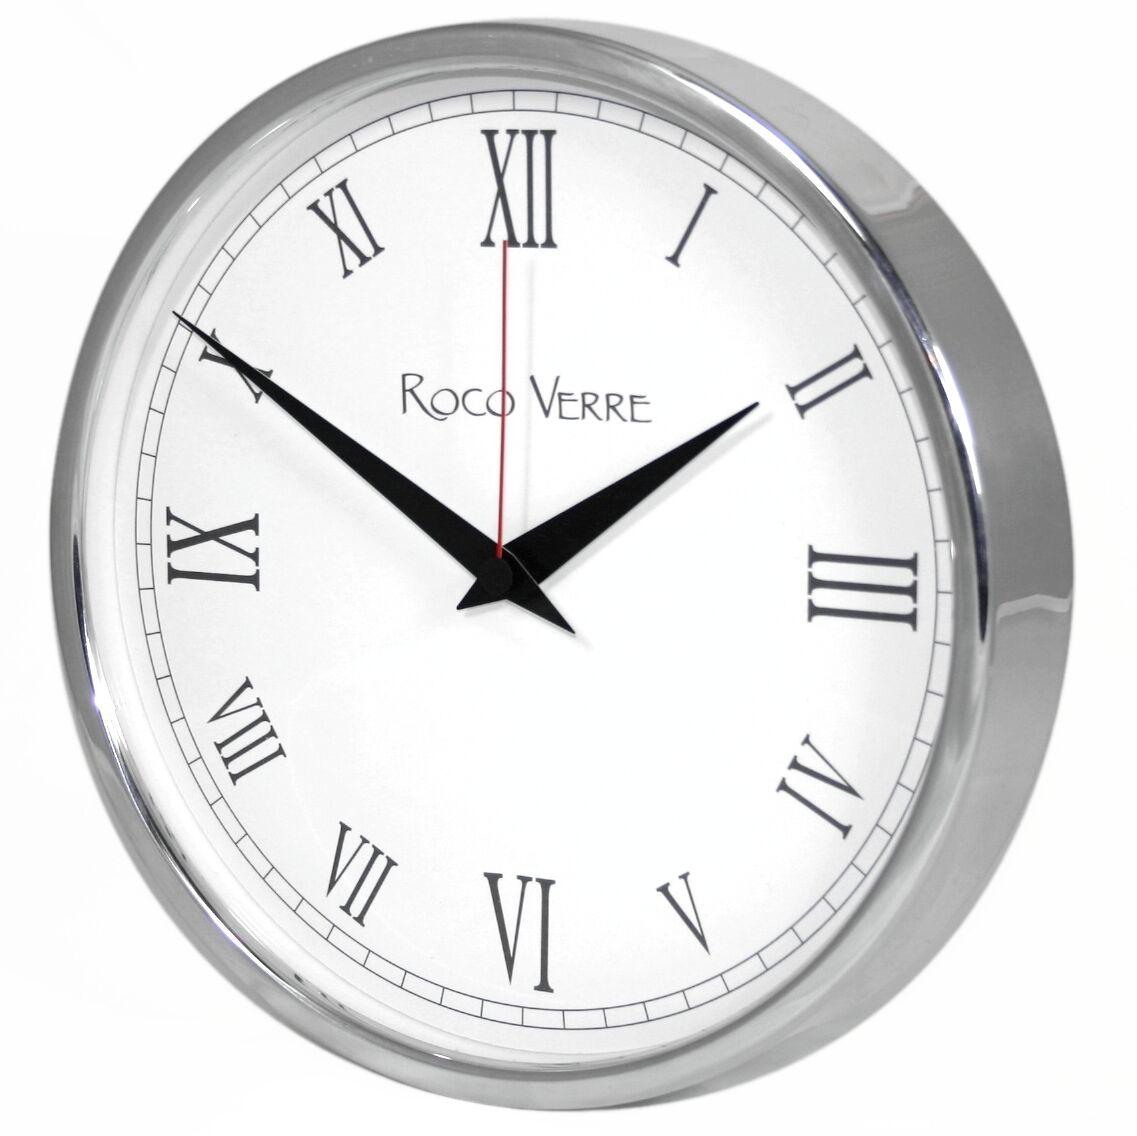 Roco Verre Modern Klassisch Wanduhr Wanduhr Wanduhr 26cm Poliert Gebürstet 5 Ziffernblatt 9636b3